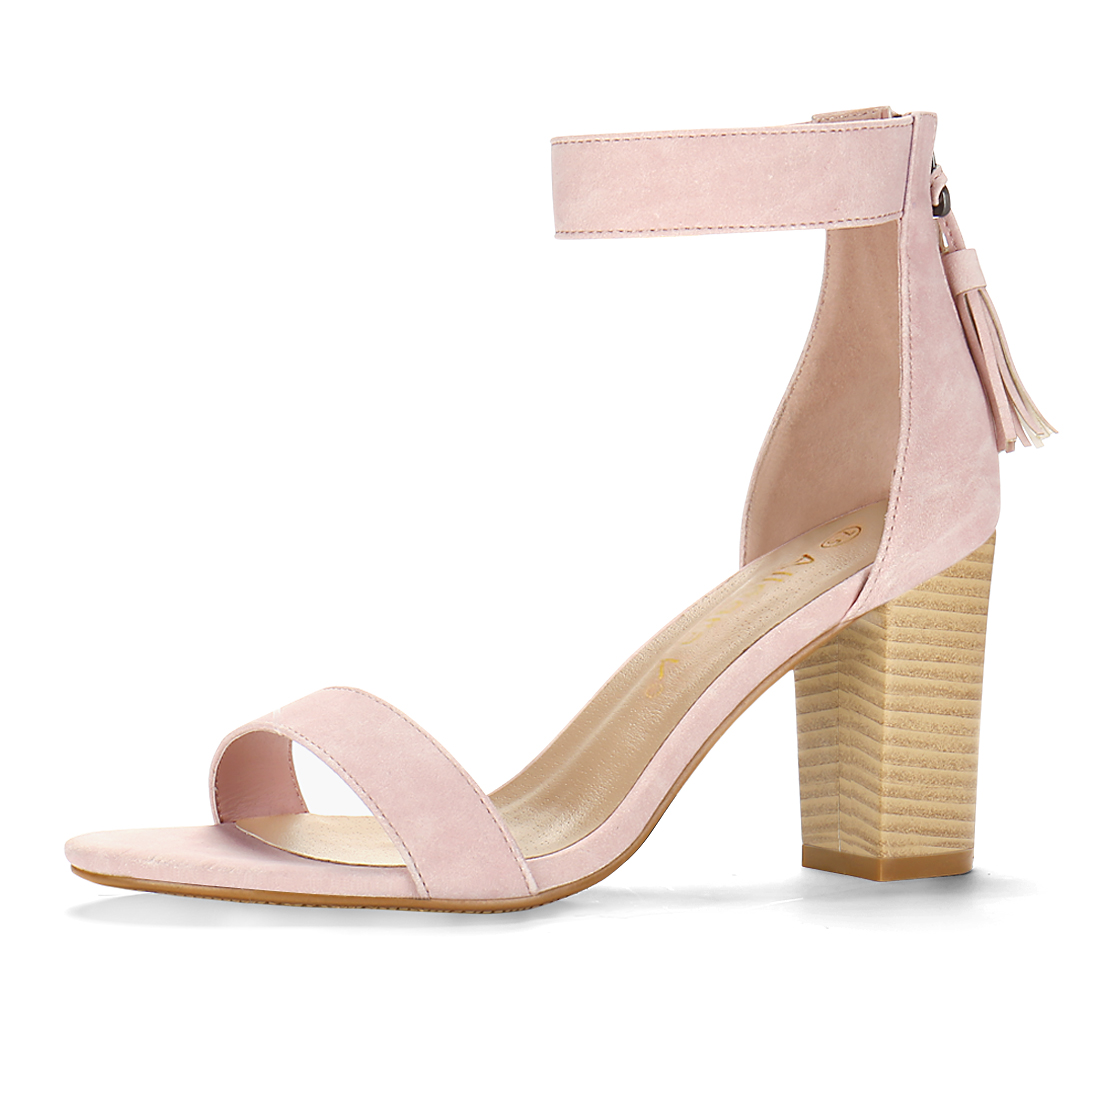 Women Open Toe Tassel Stacked Heel Ankle Strap Sandals Light Pink US 11.5